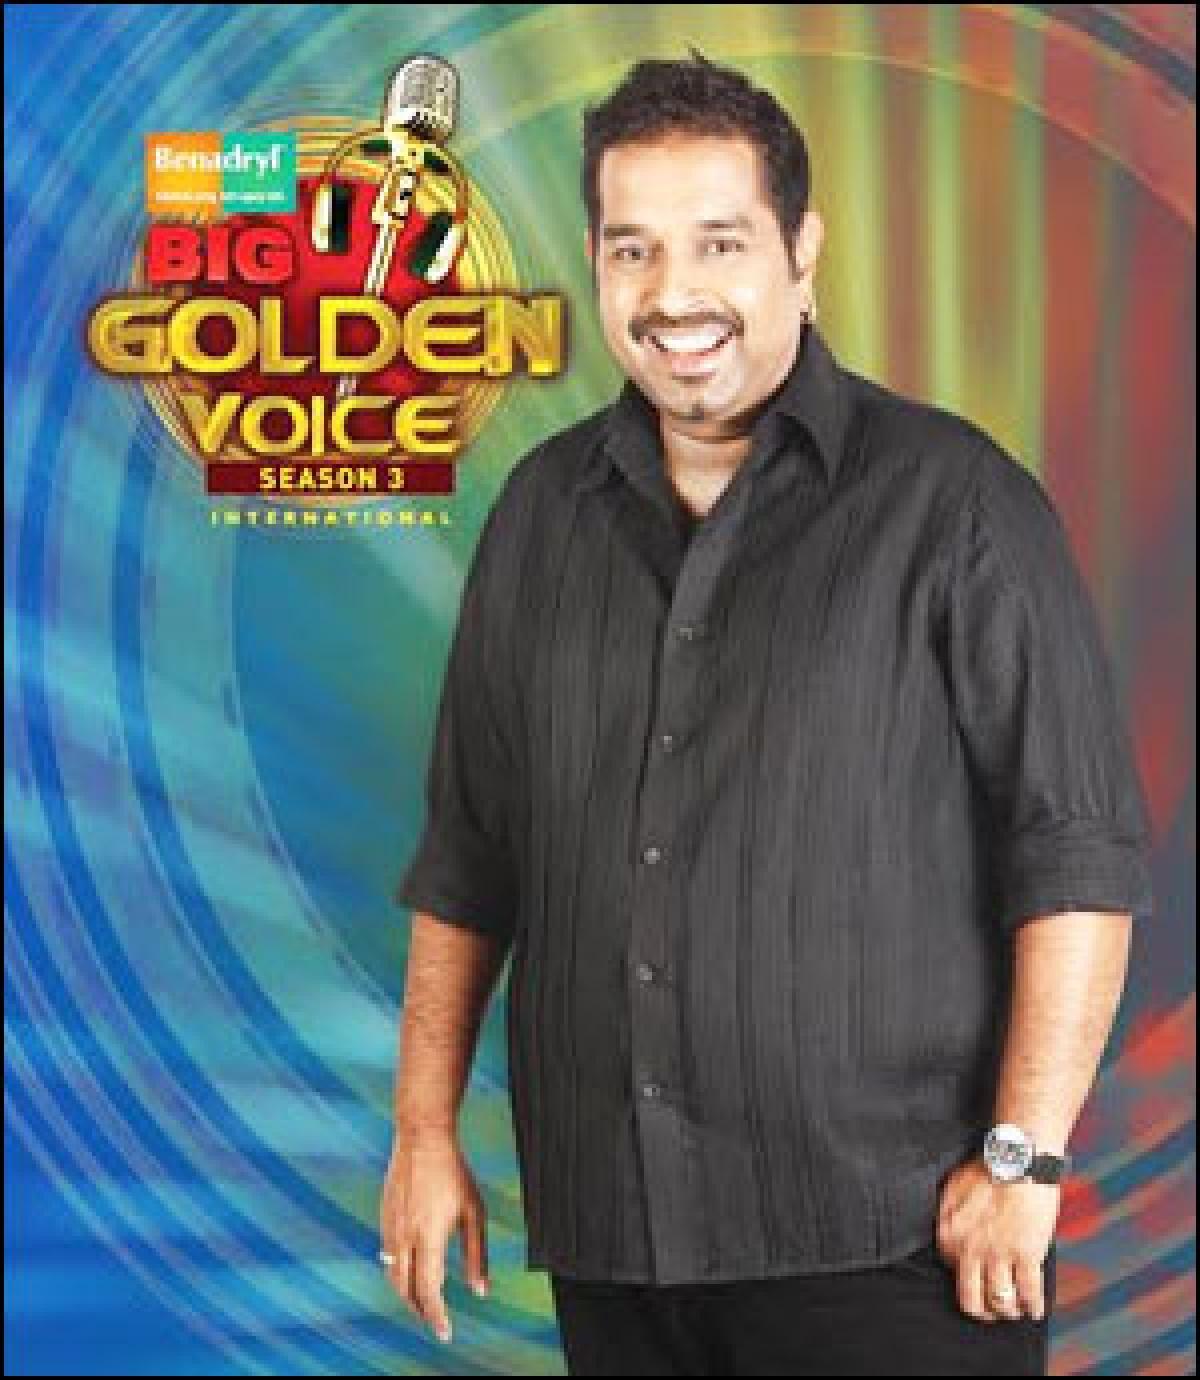 Big FM launches third season of 'Benadryl Big Golden Voice'